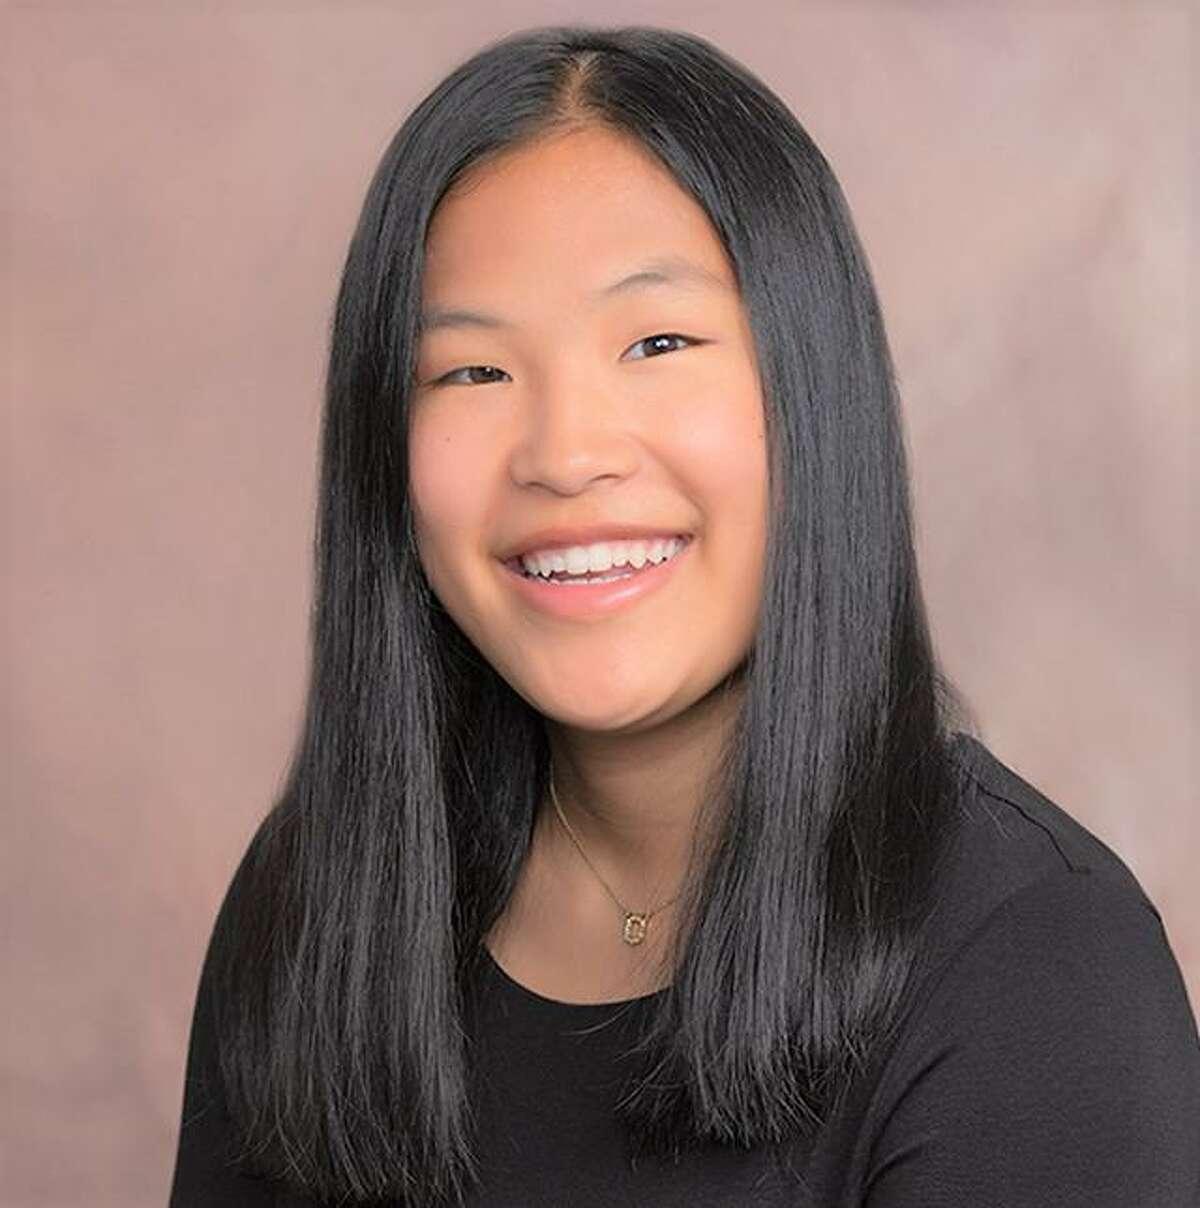 Mercy High School student Lily Herron